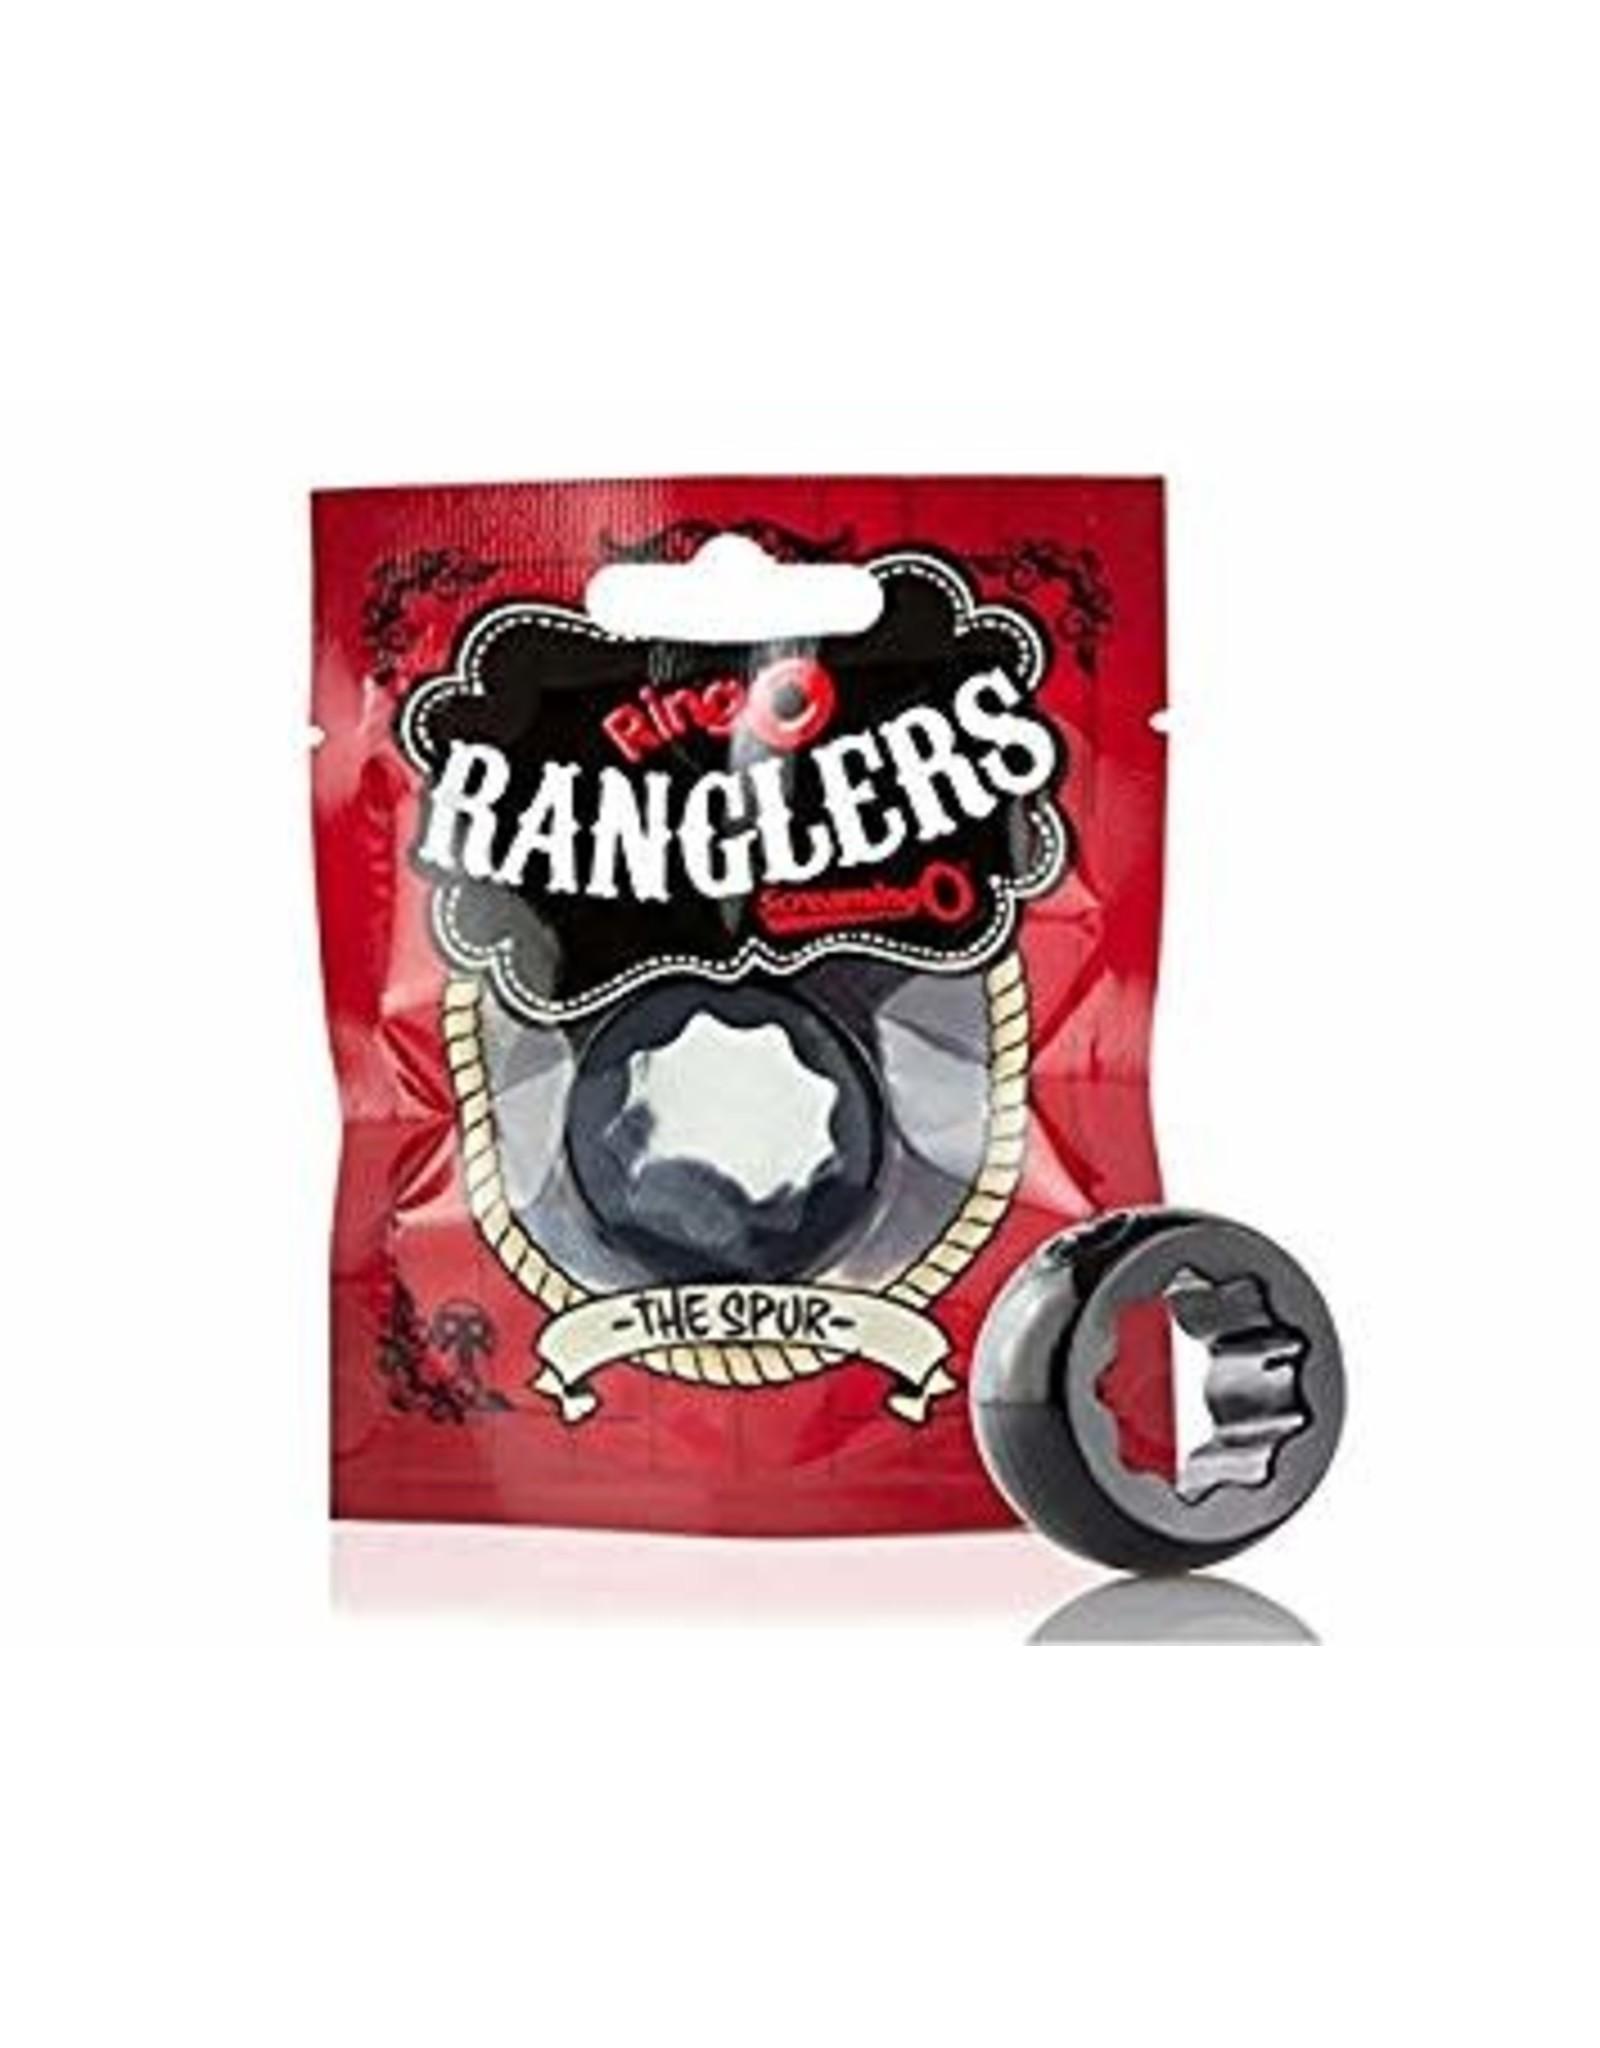 SCREAMING O - RINGO - RANGLERS COCK RING - THE SPUR